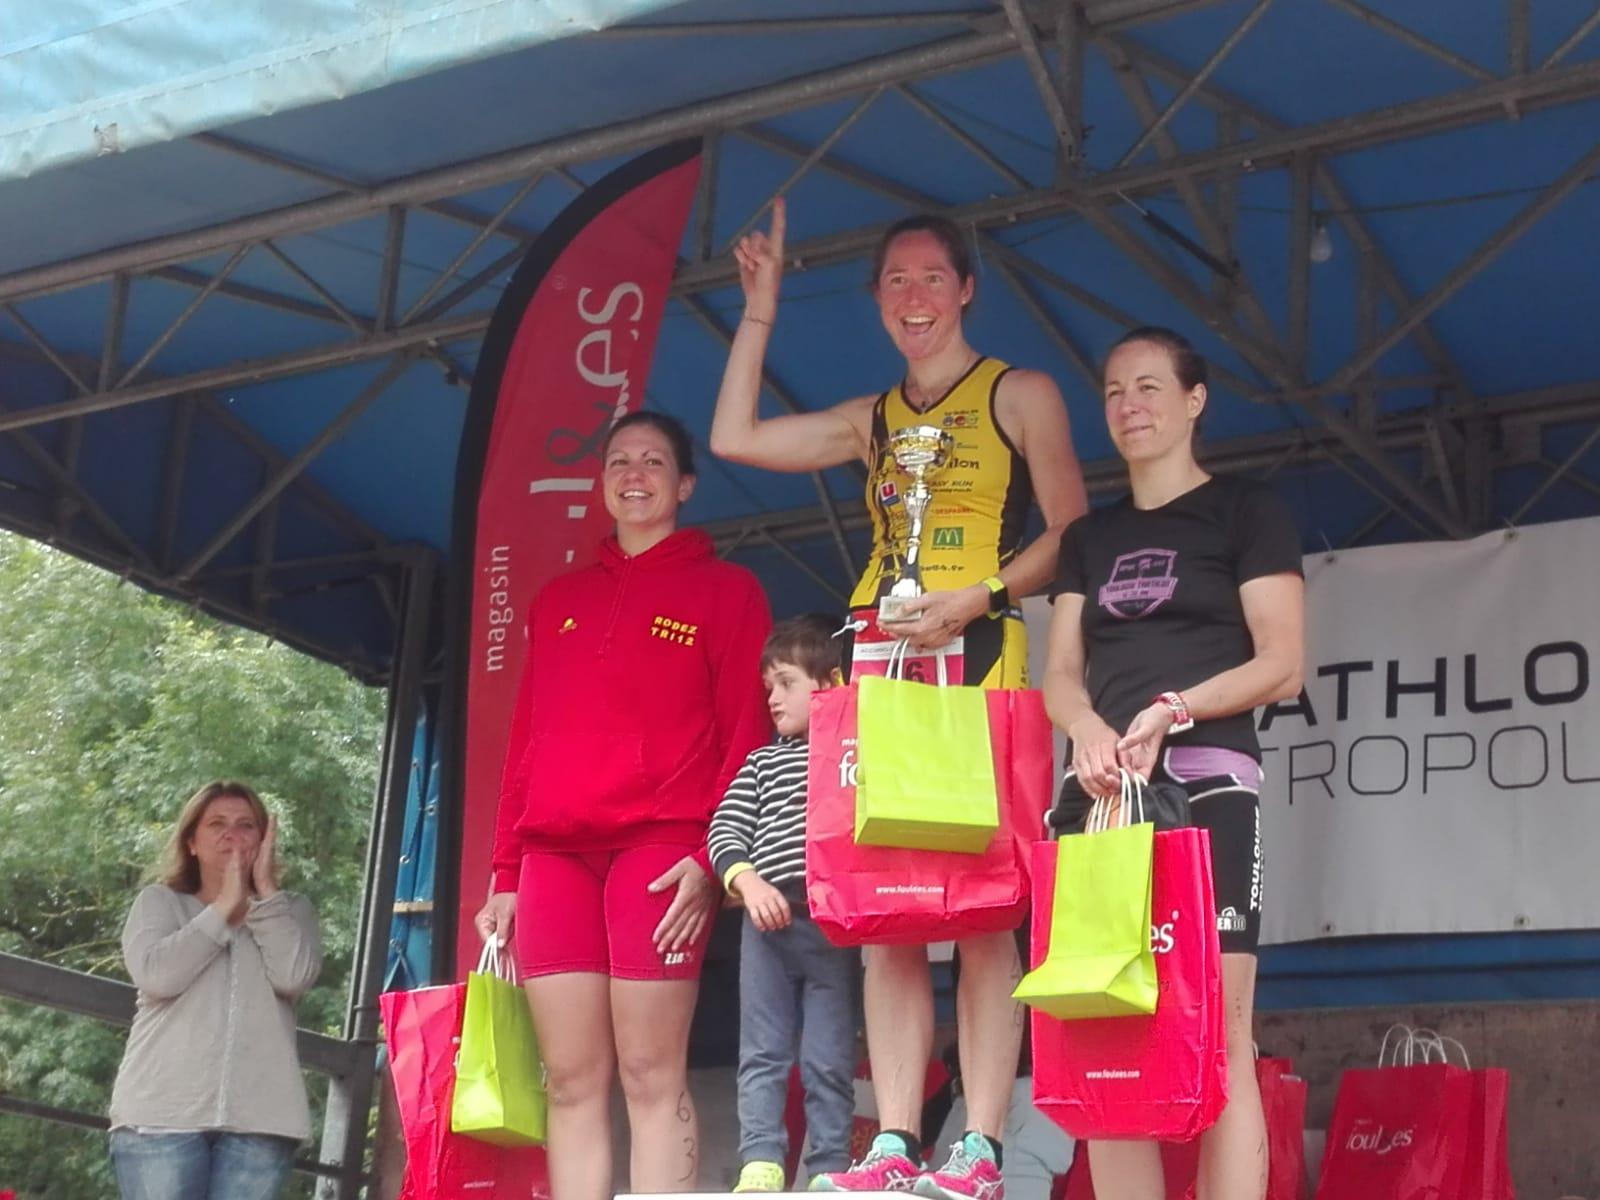 Le podium féminin du Triathlon M de Revel 2018